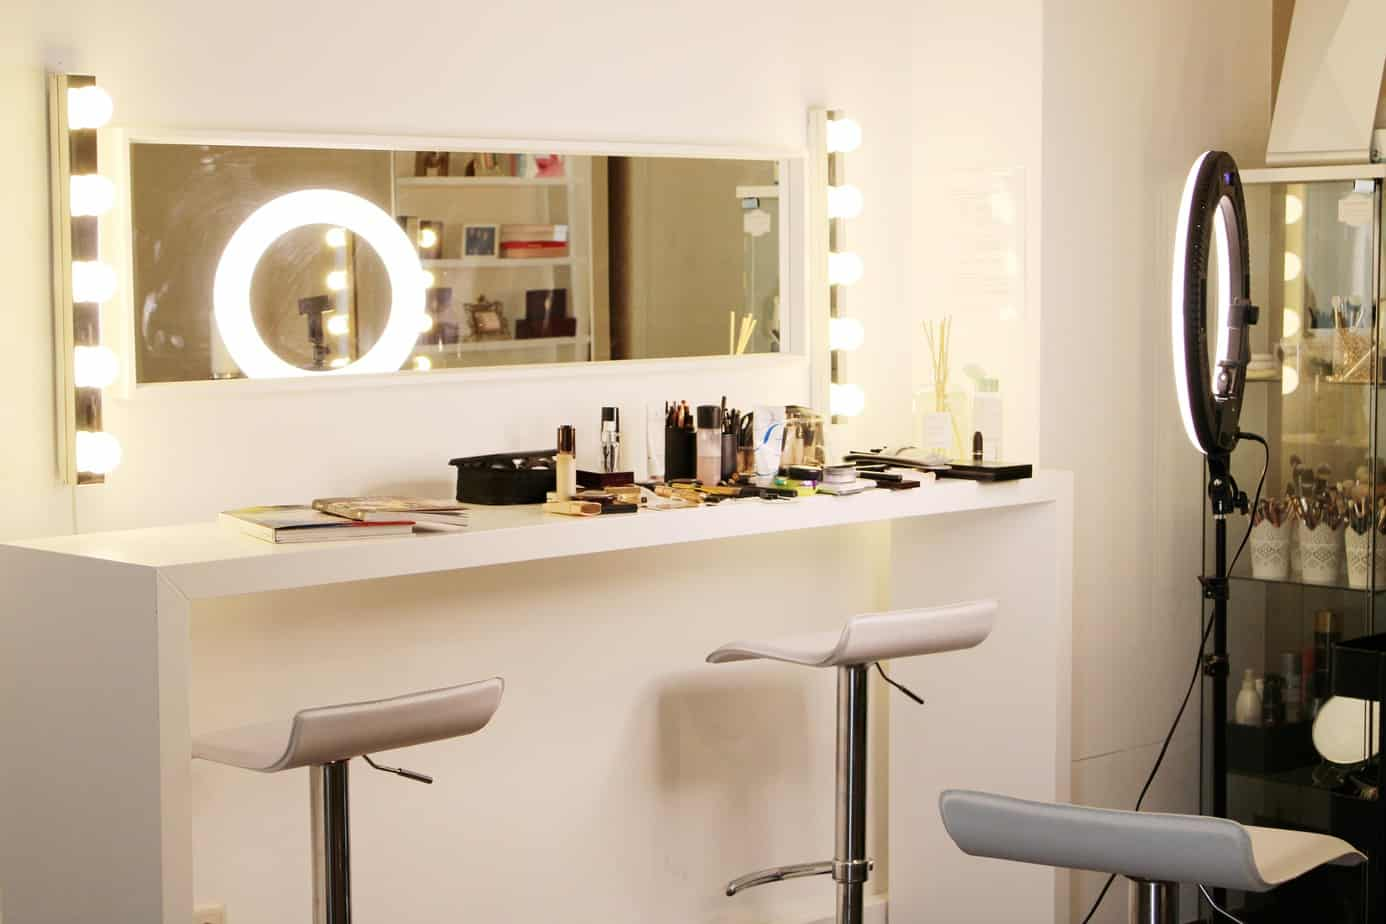 estudio de maquilhagem luzes